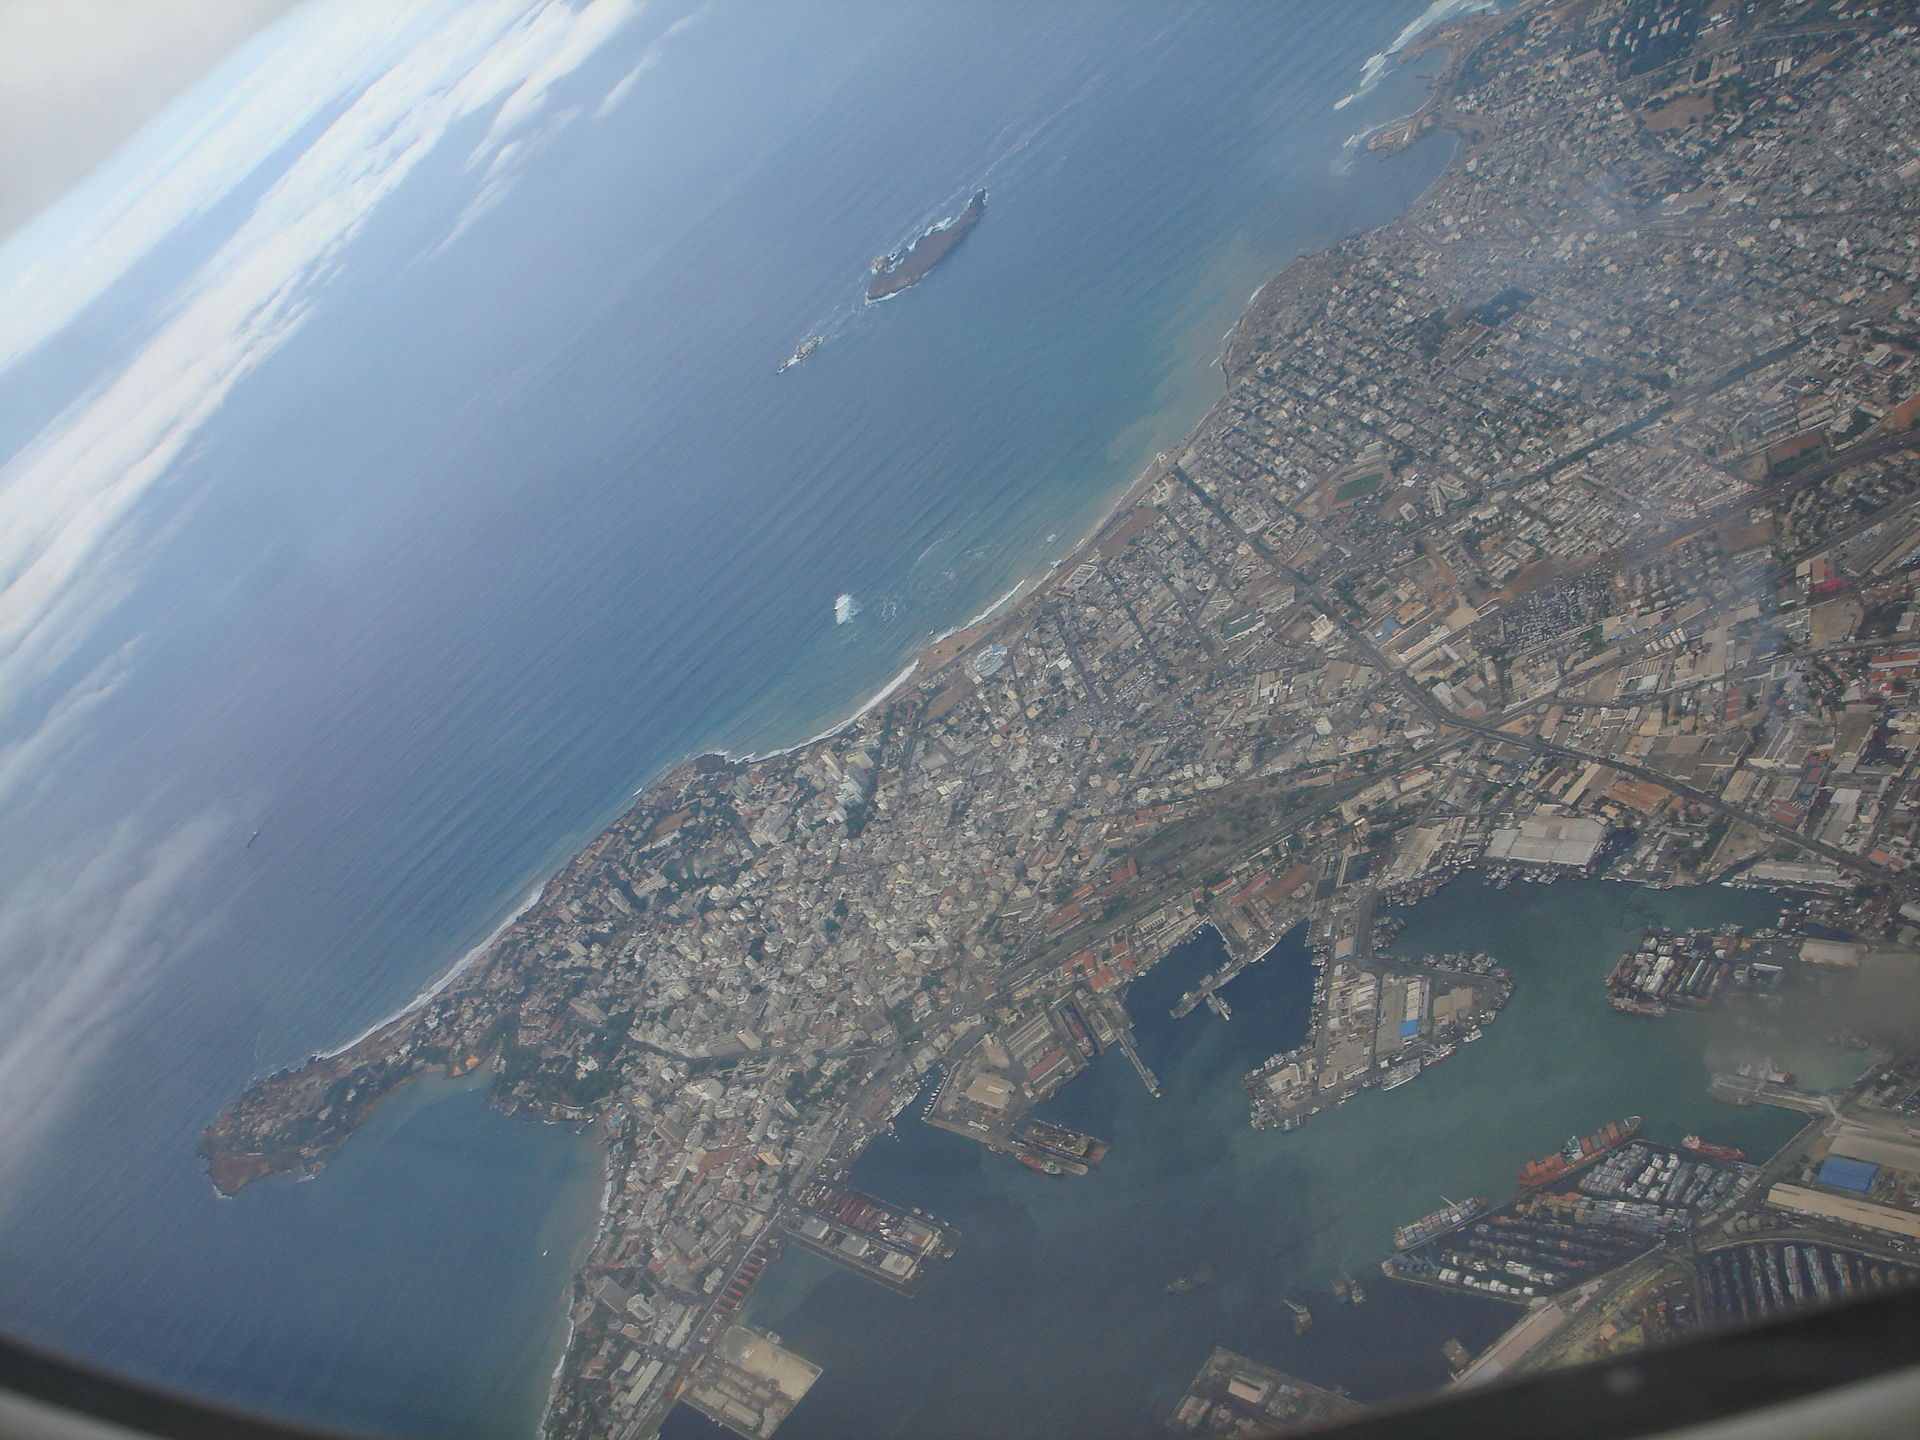 Cheap Flights And Hotels To Rio De Janeiro